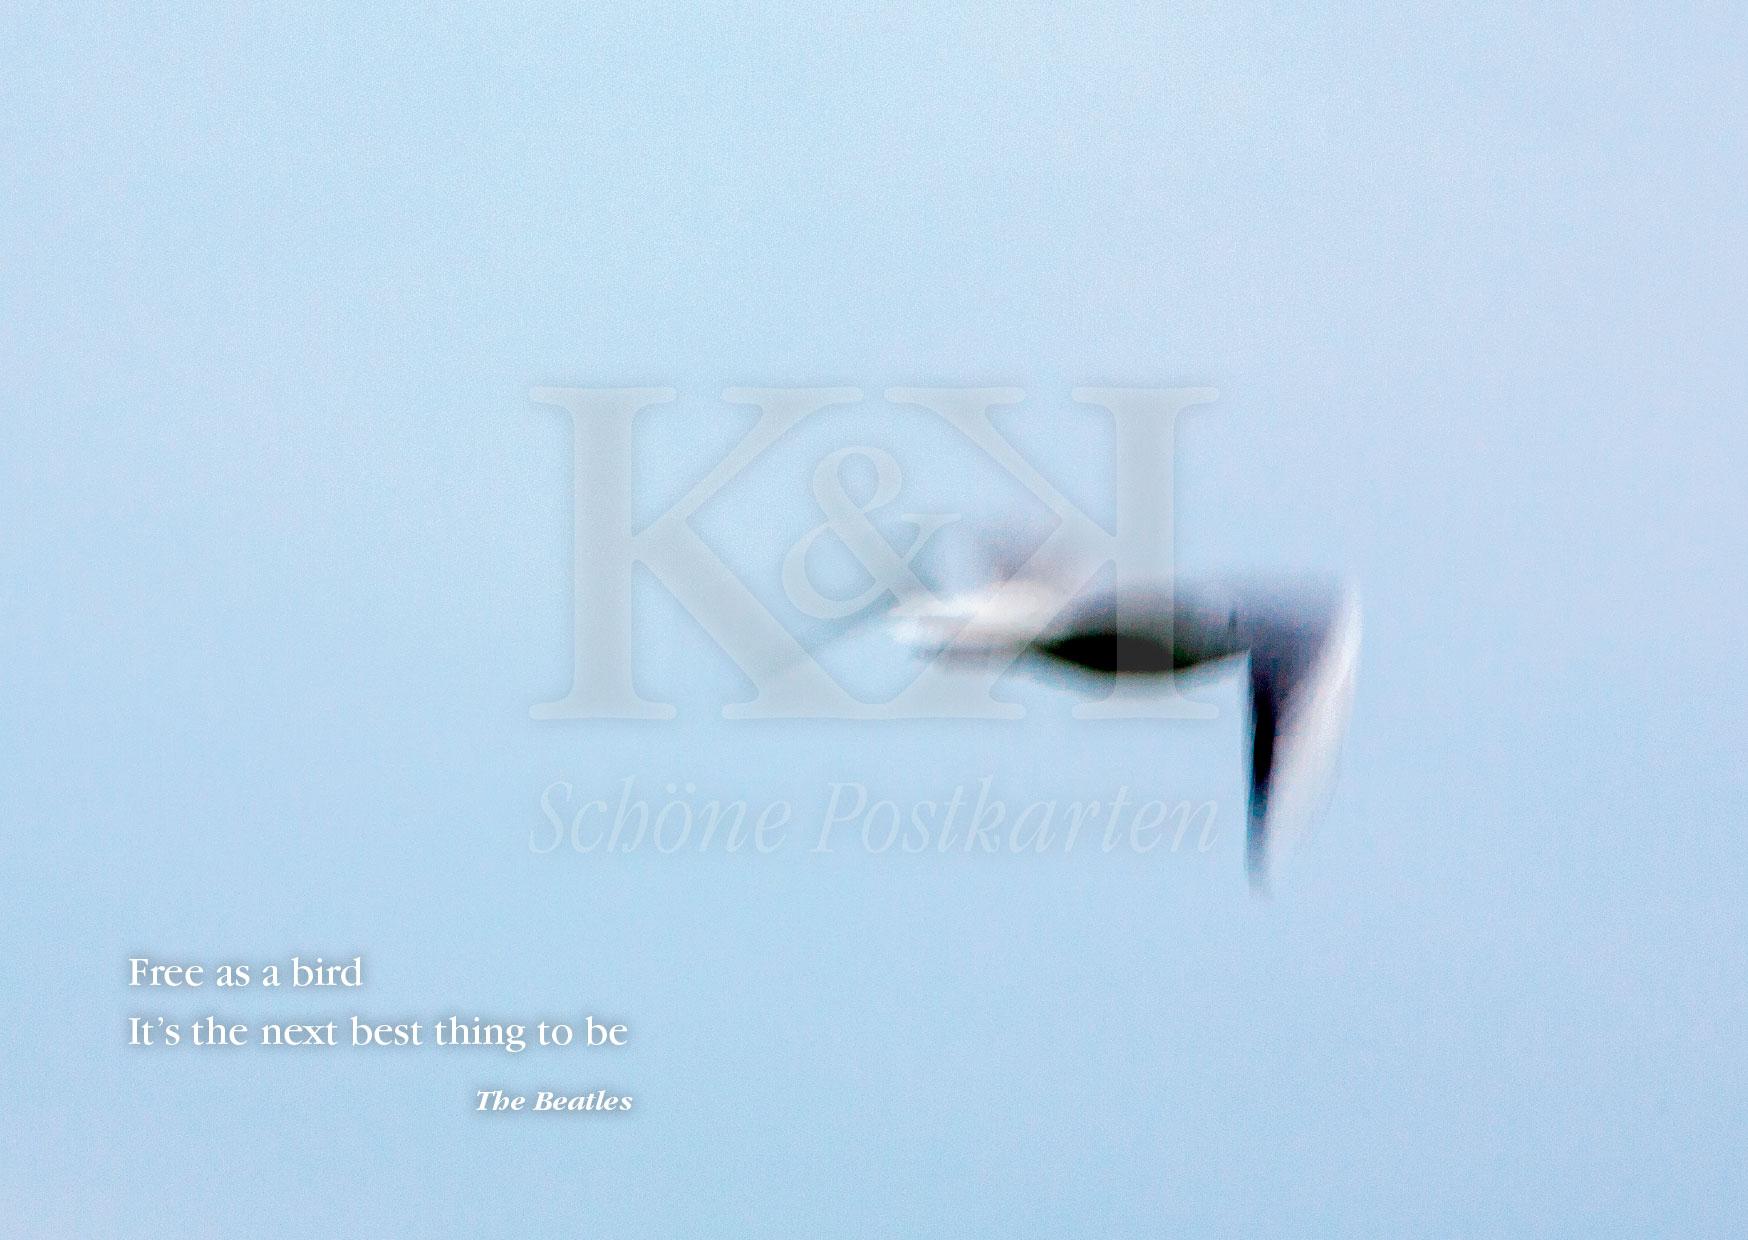 >>> NEU: Schöne Postkarte Nr. 70 · Free as a bird – wären wir wohl alle manchmal gerne